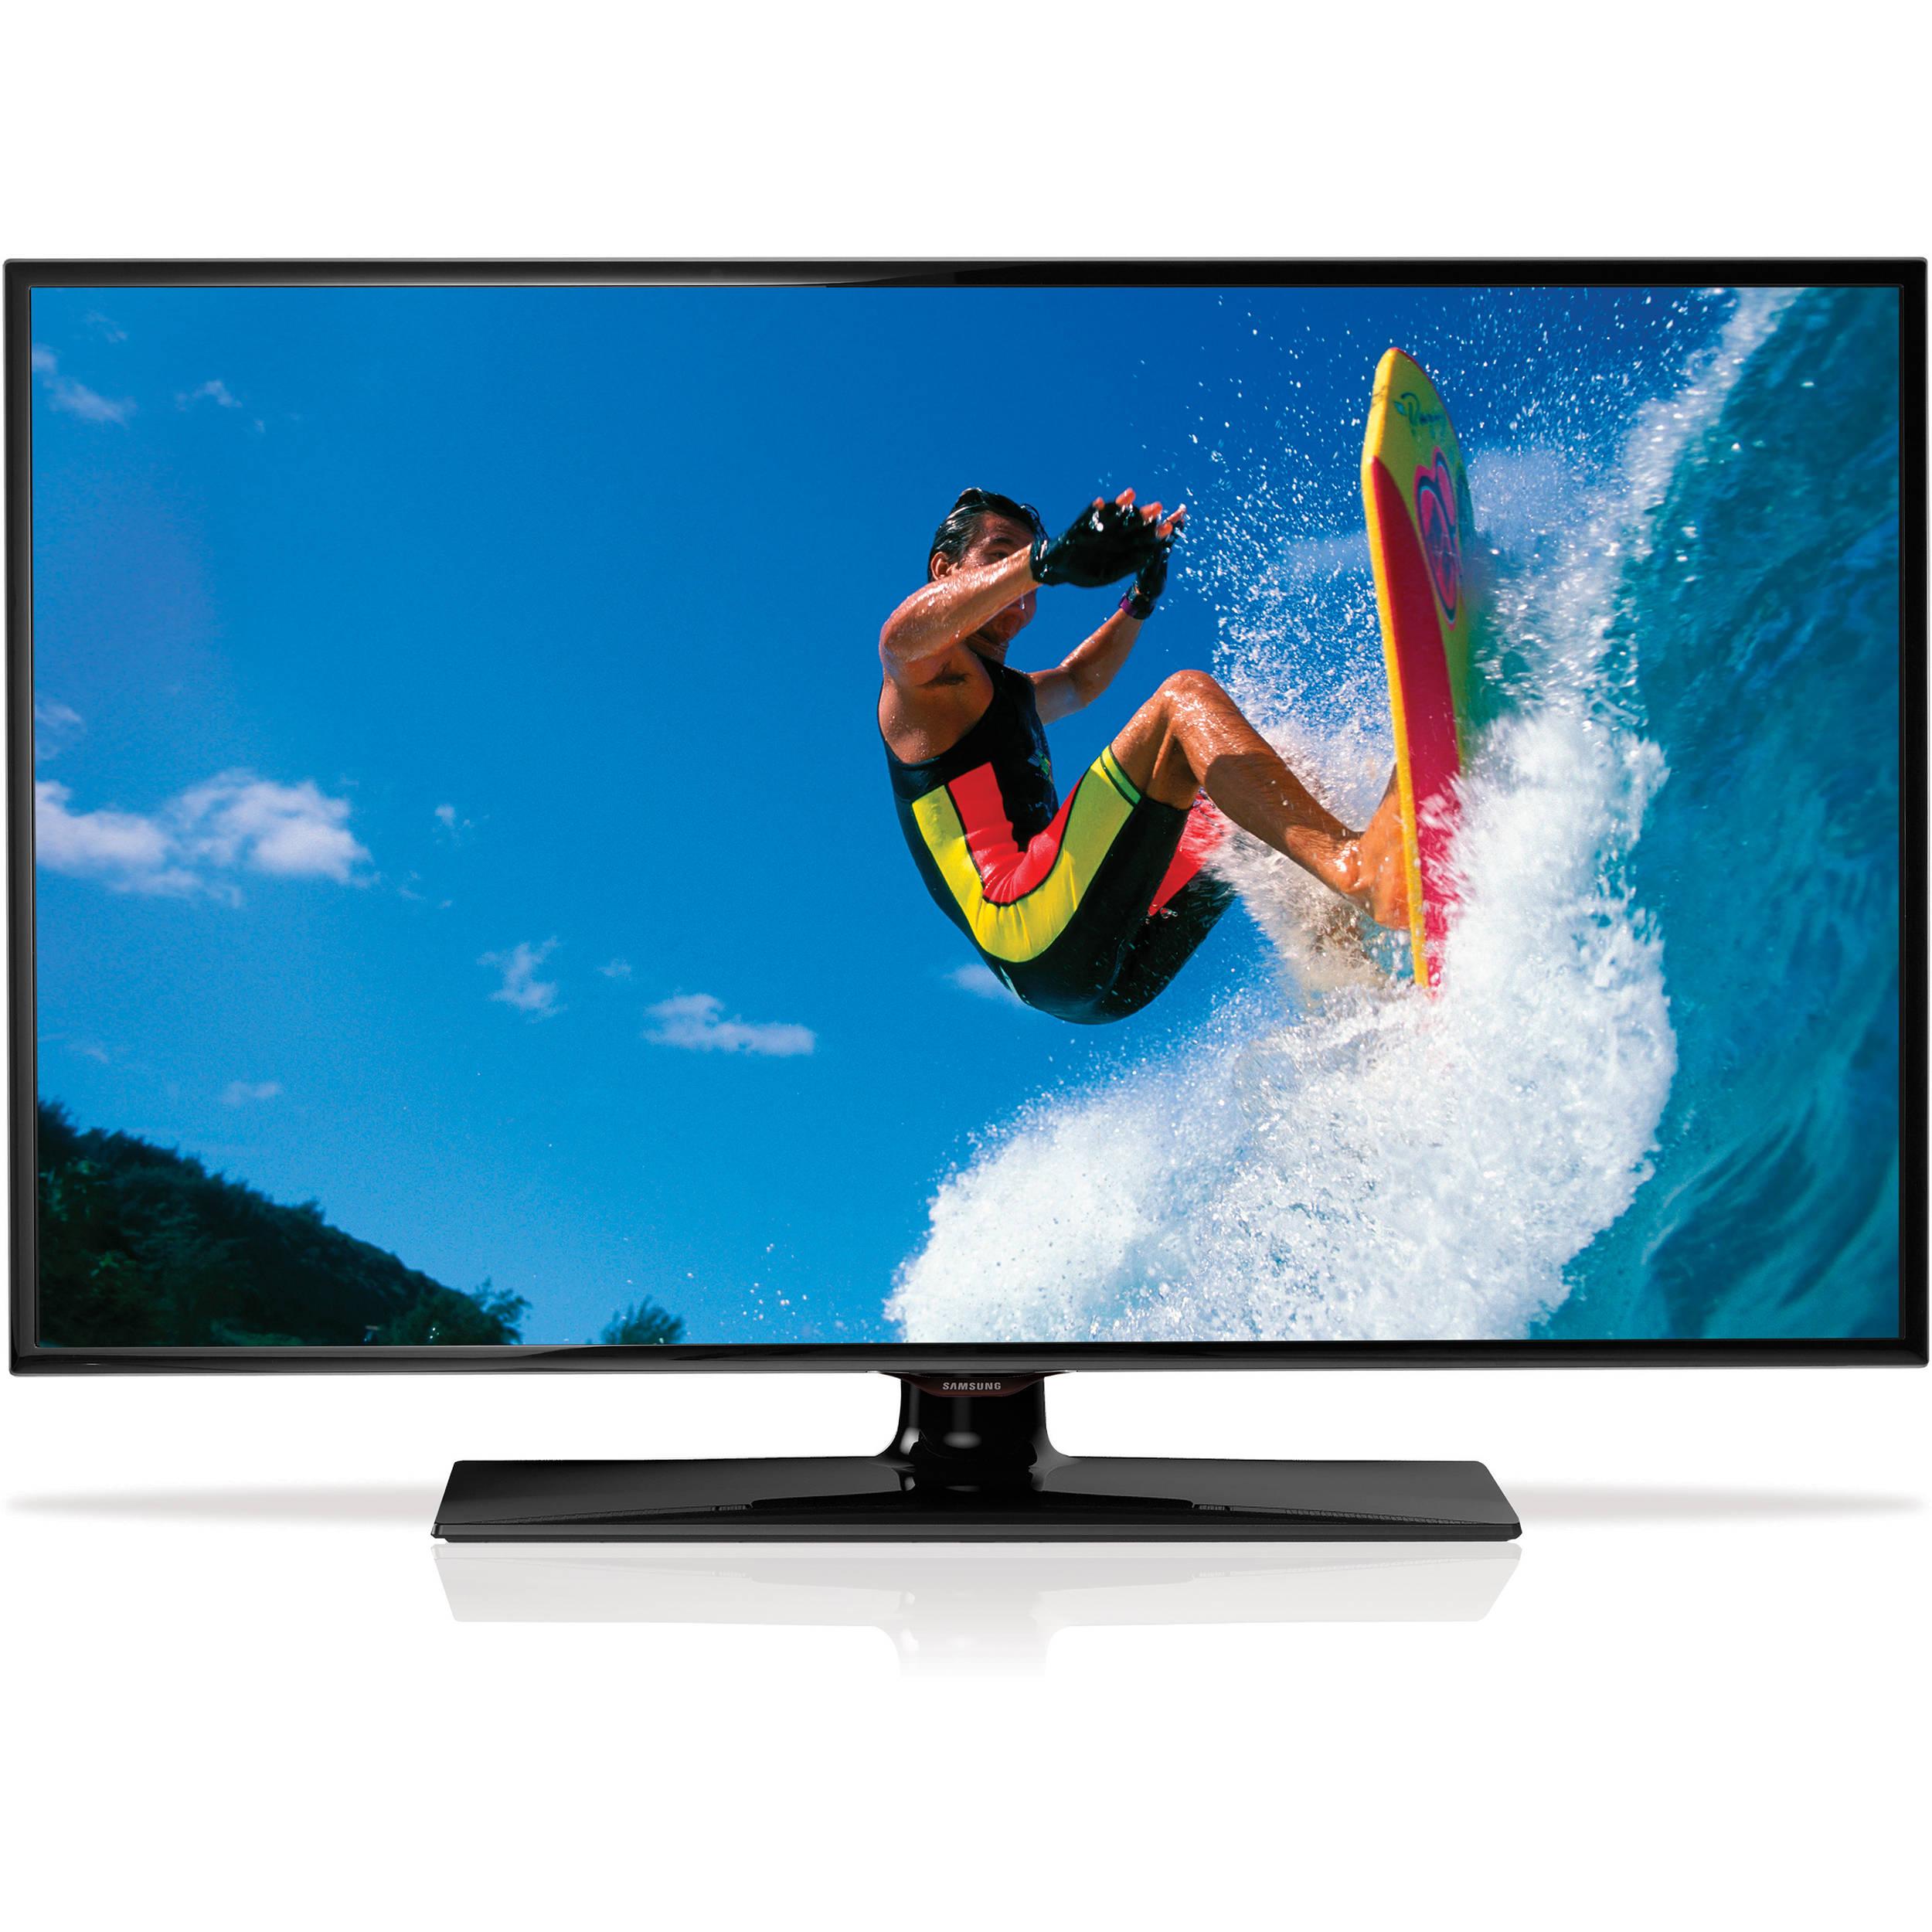 Samsung 32 5000 Full Hd Led Tv Un32f5000afxza B H